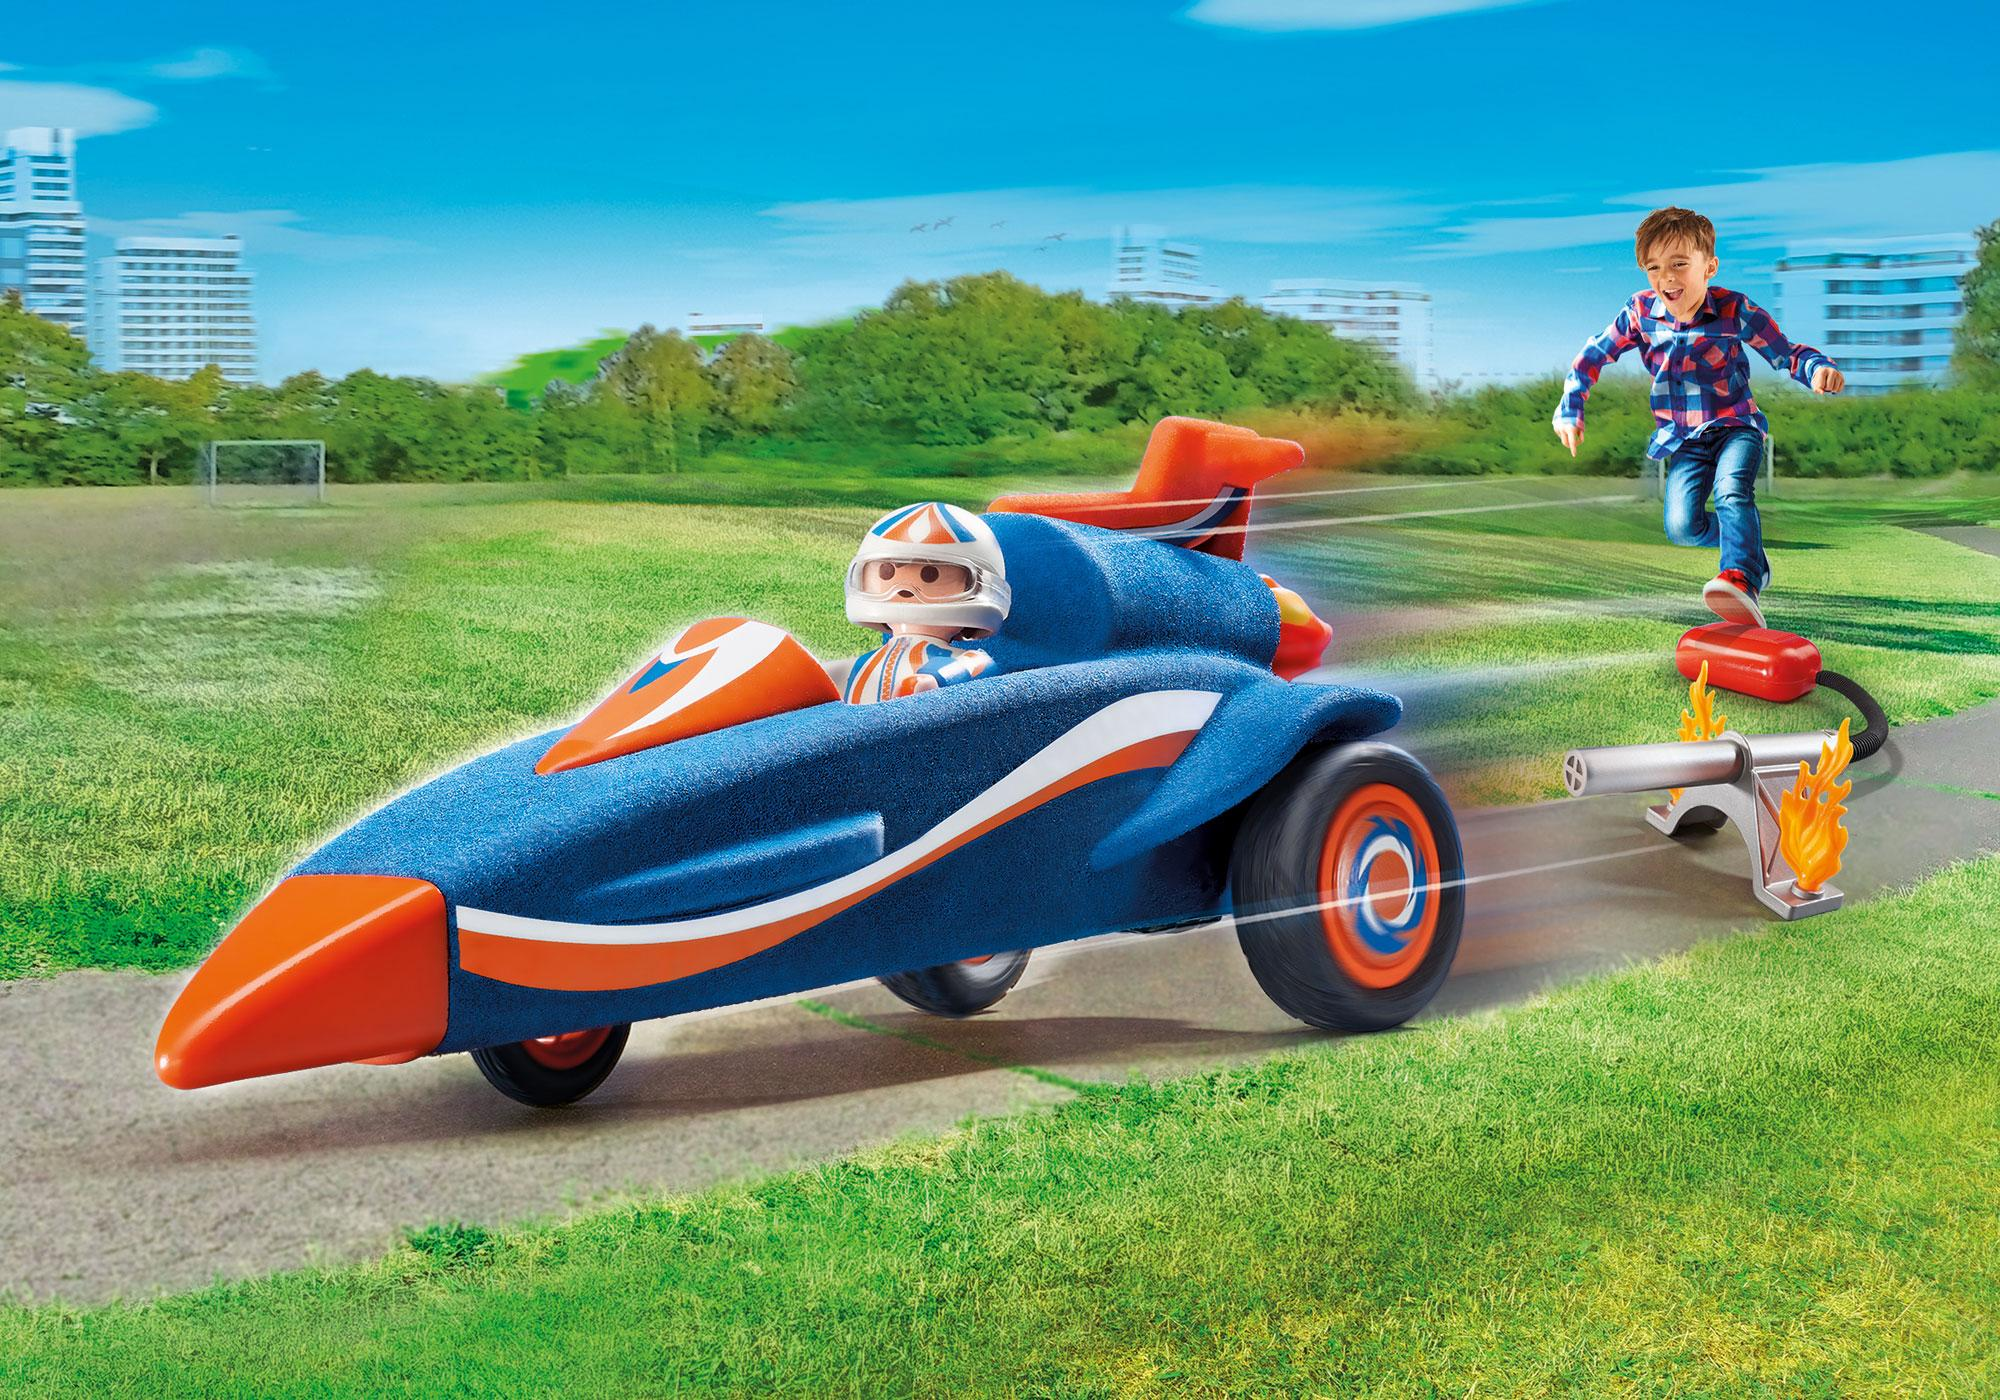 http://media.playmobil.com/i/playmobil/9375_product_detail/Piloot met autoraket